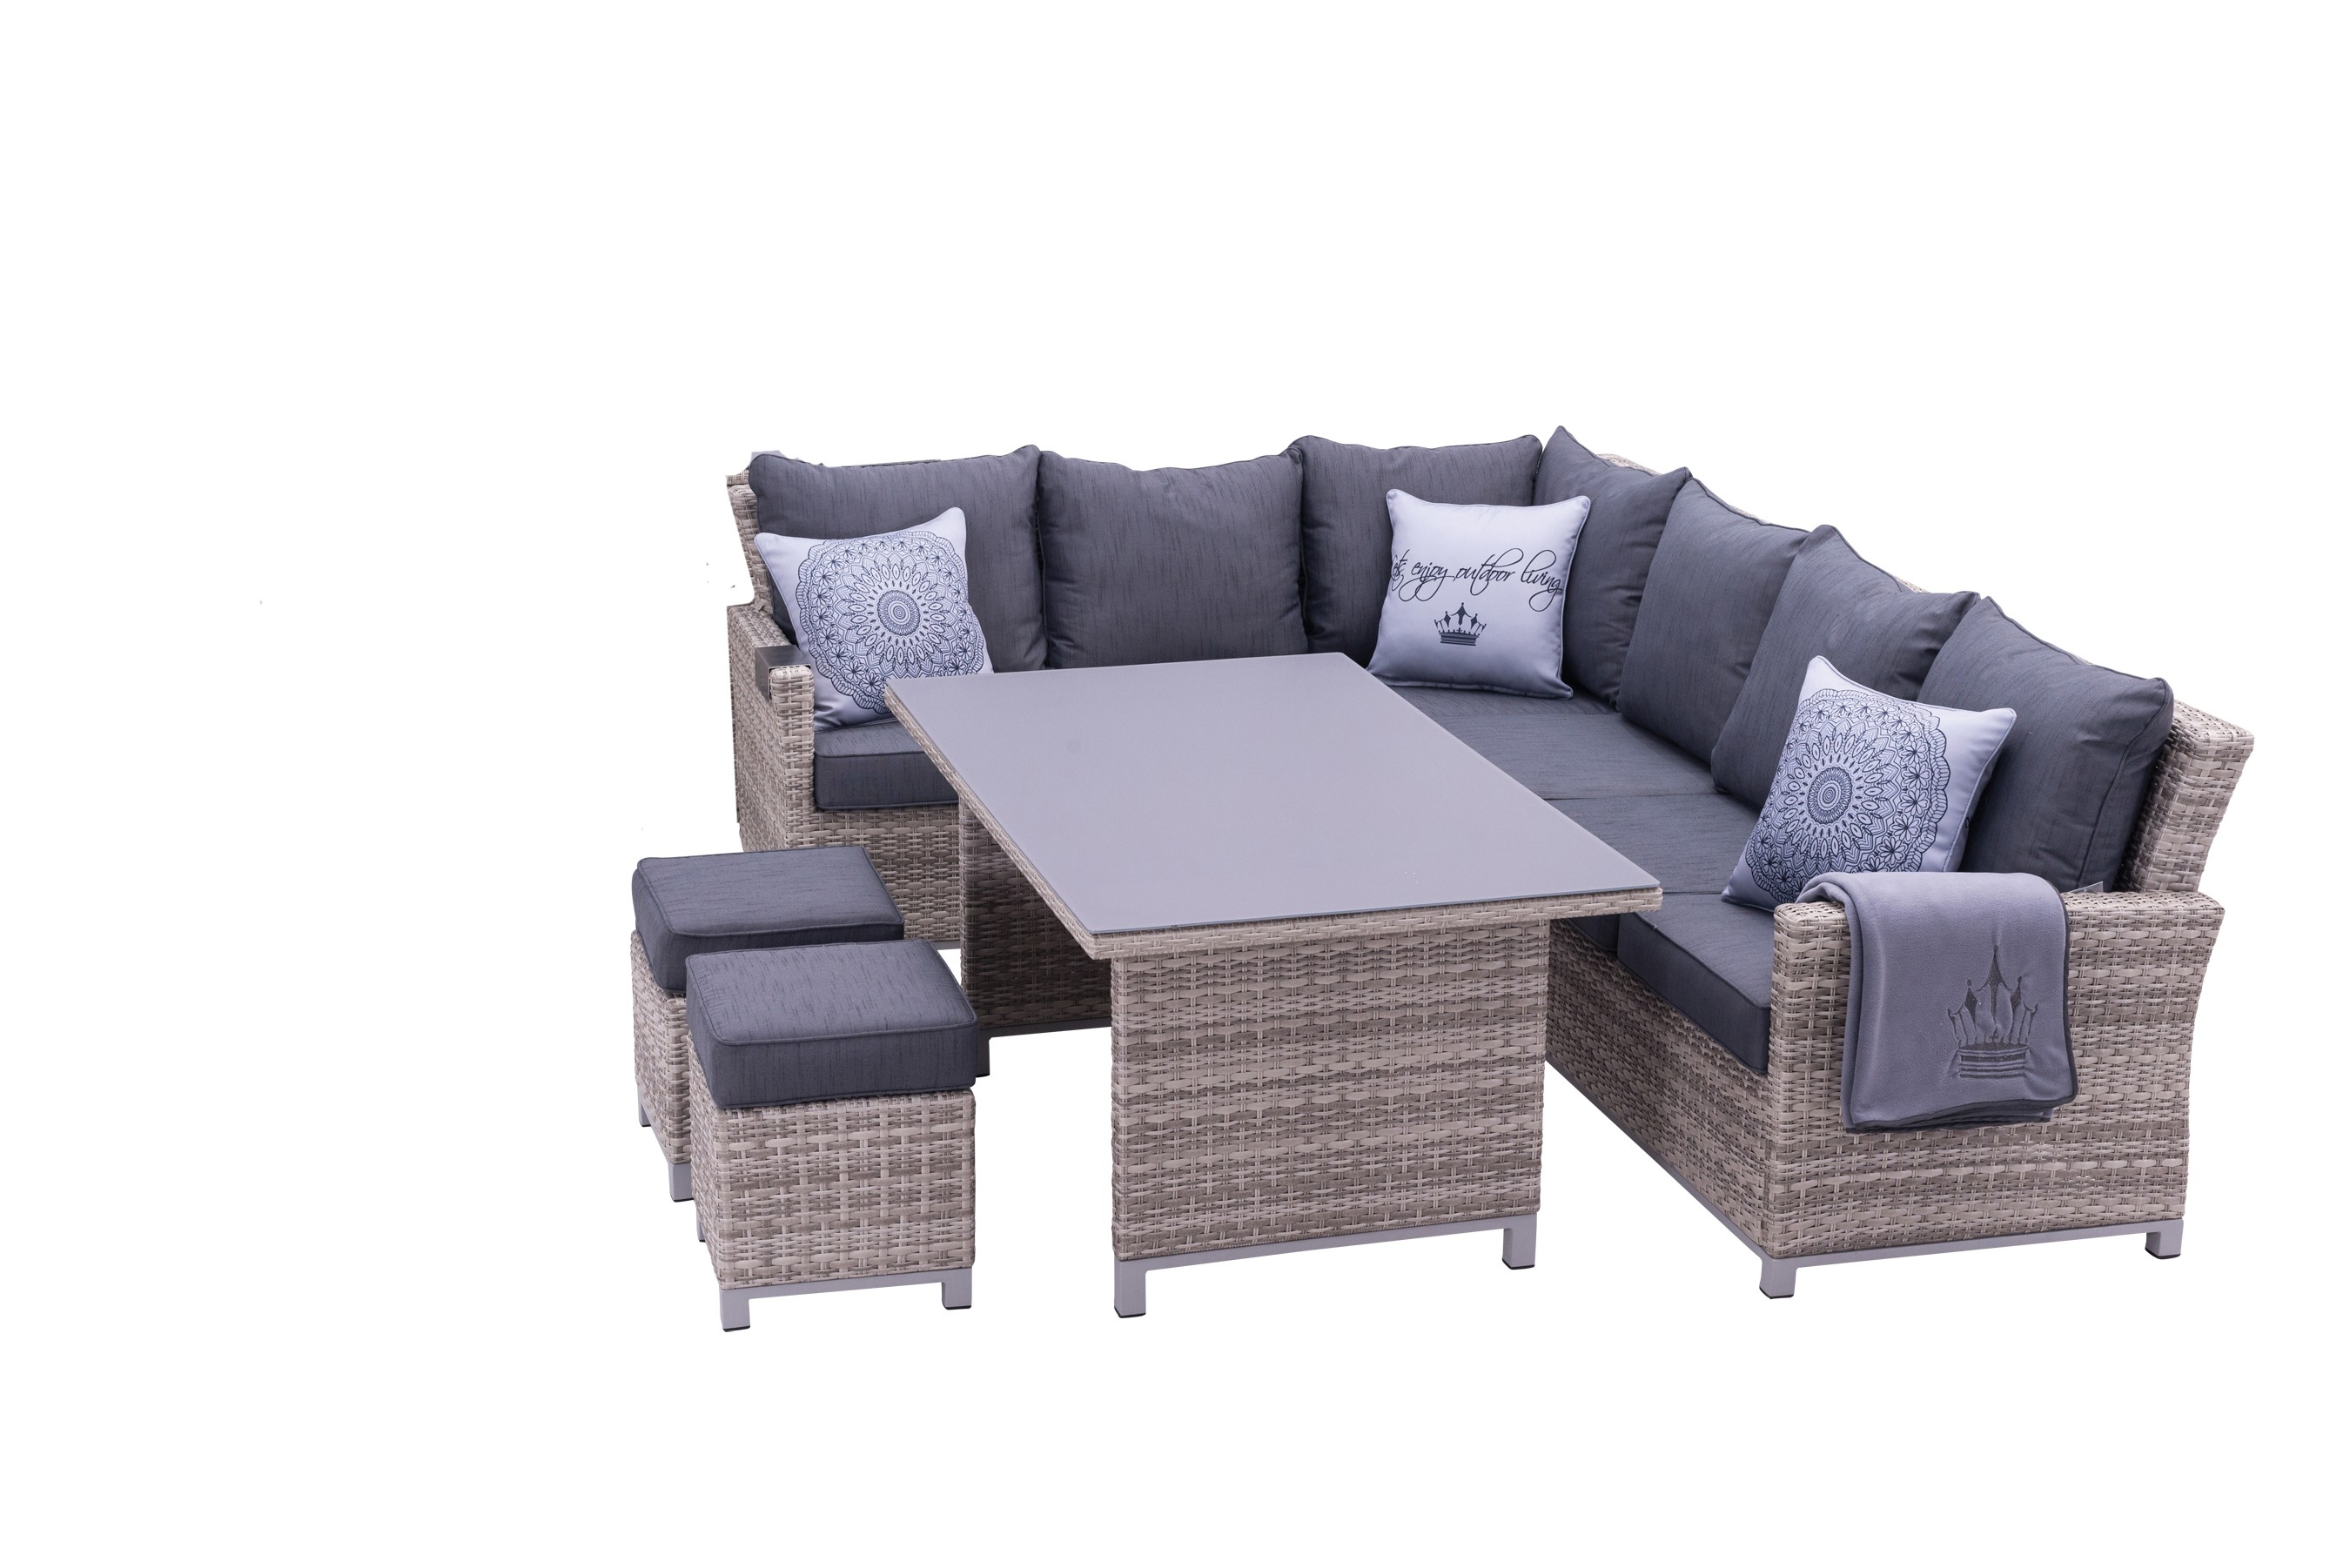 Sungörl Lounge Set / Havanna DeLuxe Set Polyrattan mixed-grey 9-teilig Bild 1